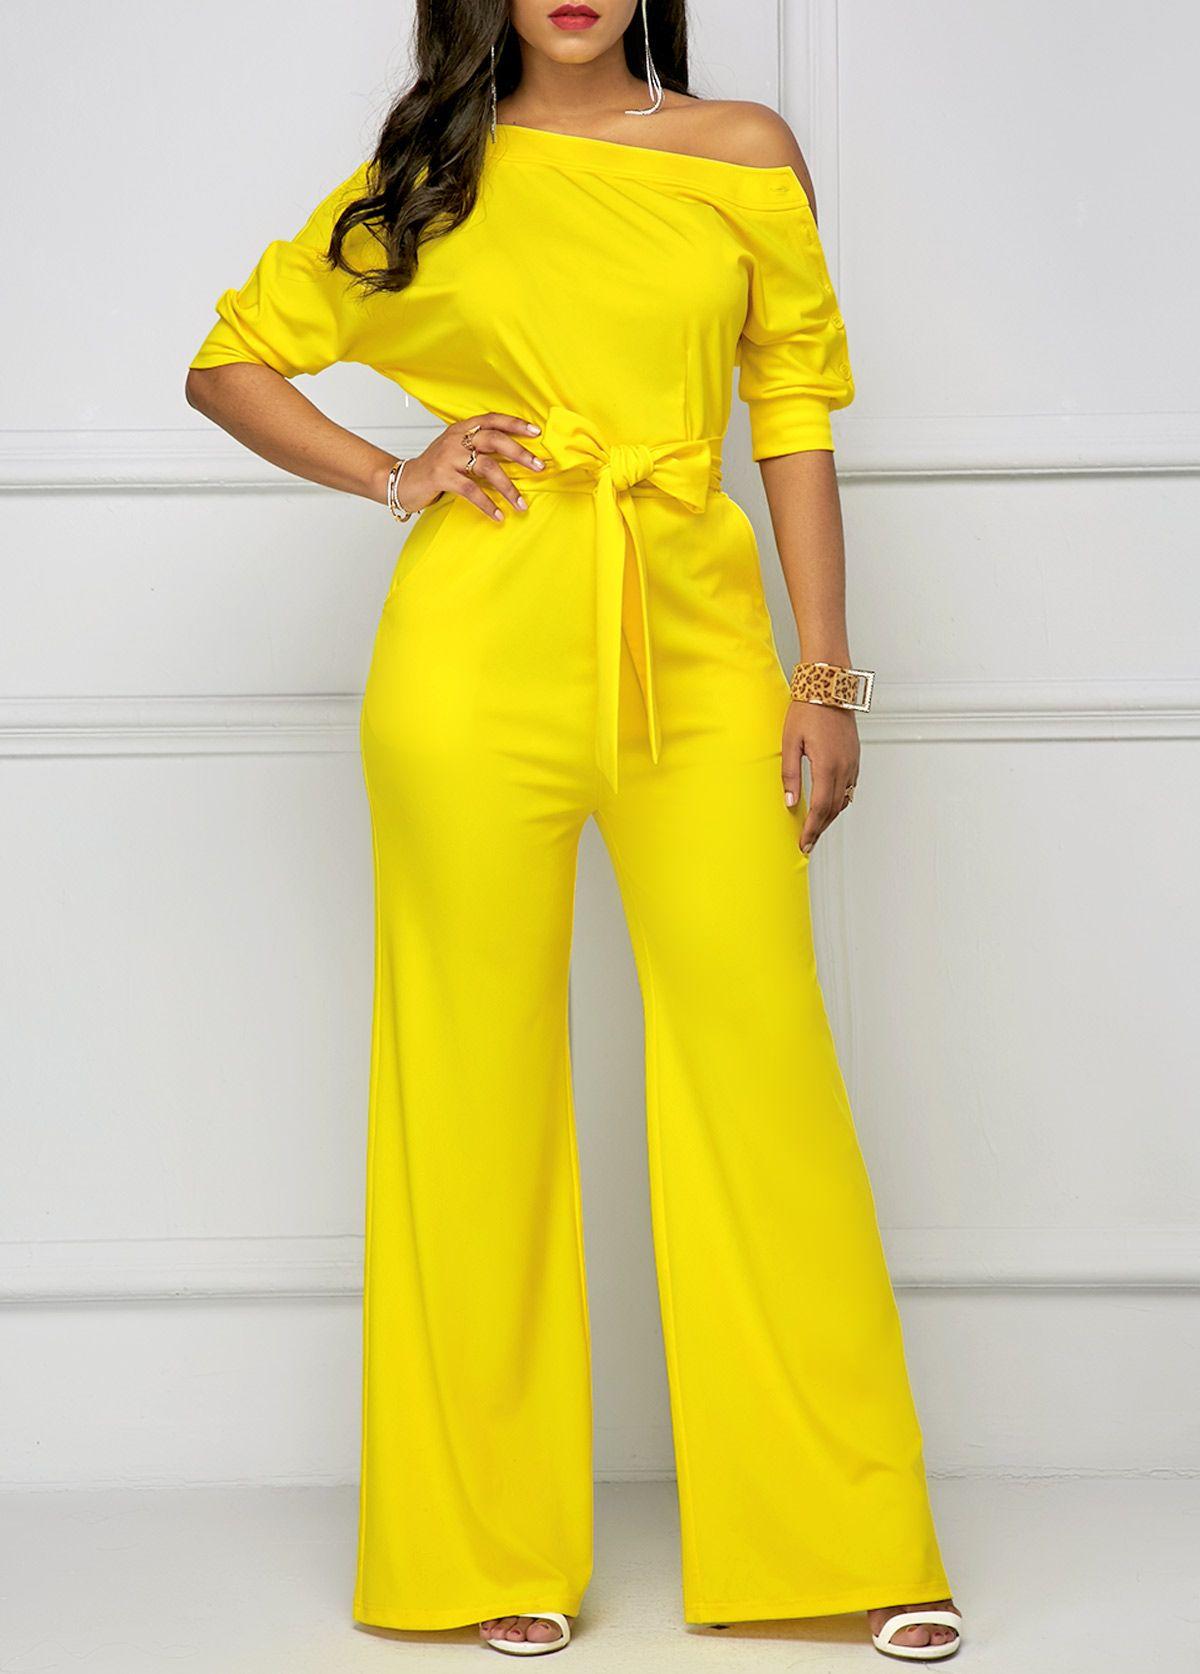 e0d6e193e26 Belted Half Sleeve Skew Neck Yellow Jumpsuit